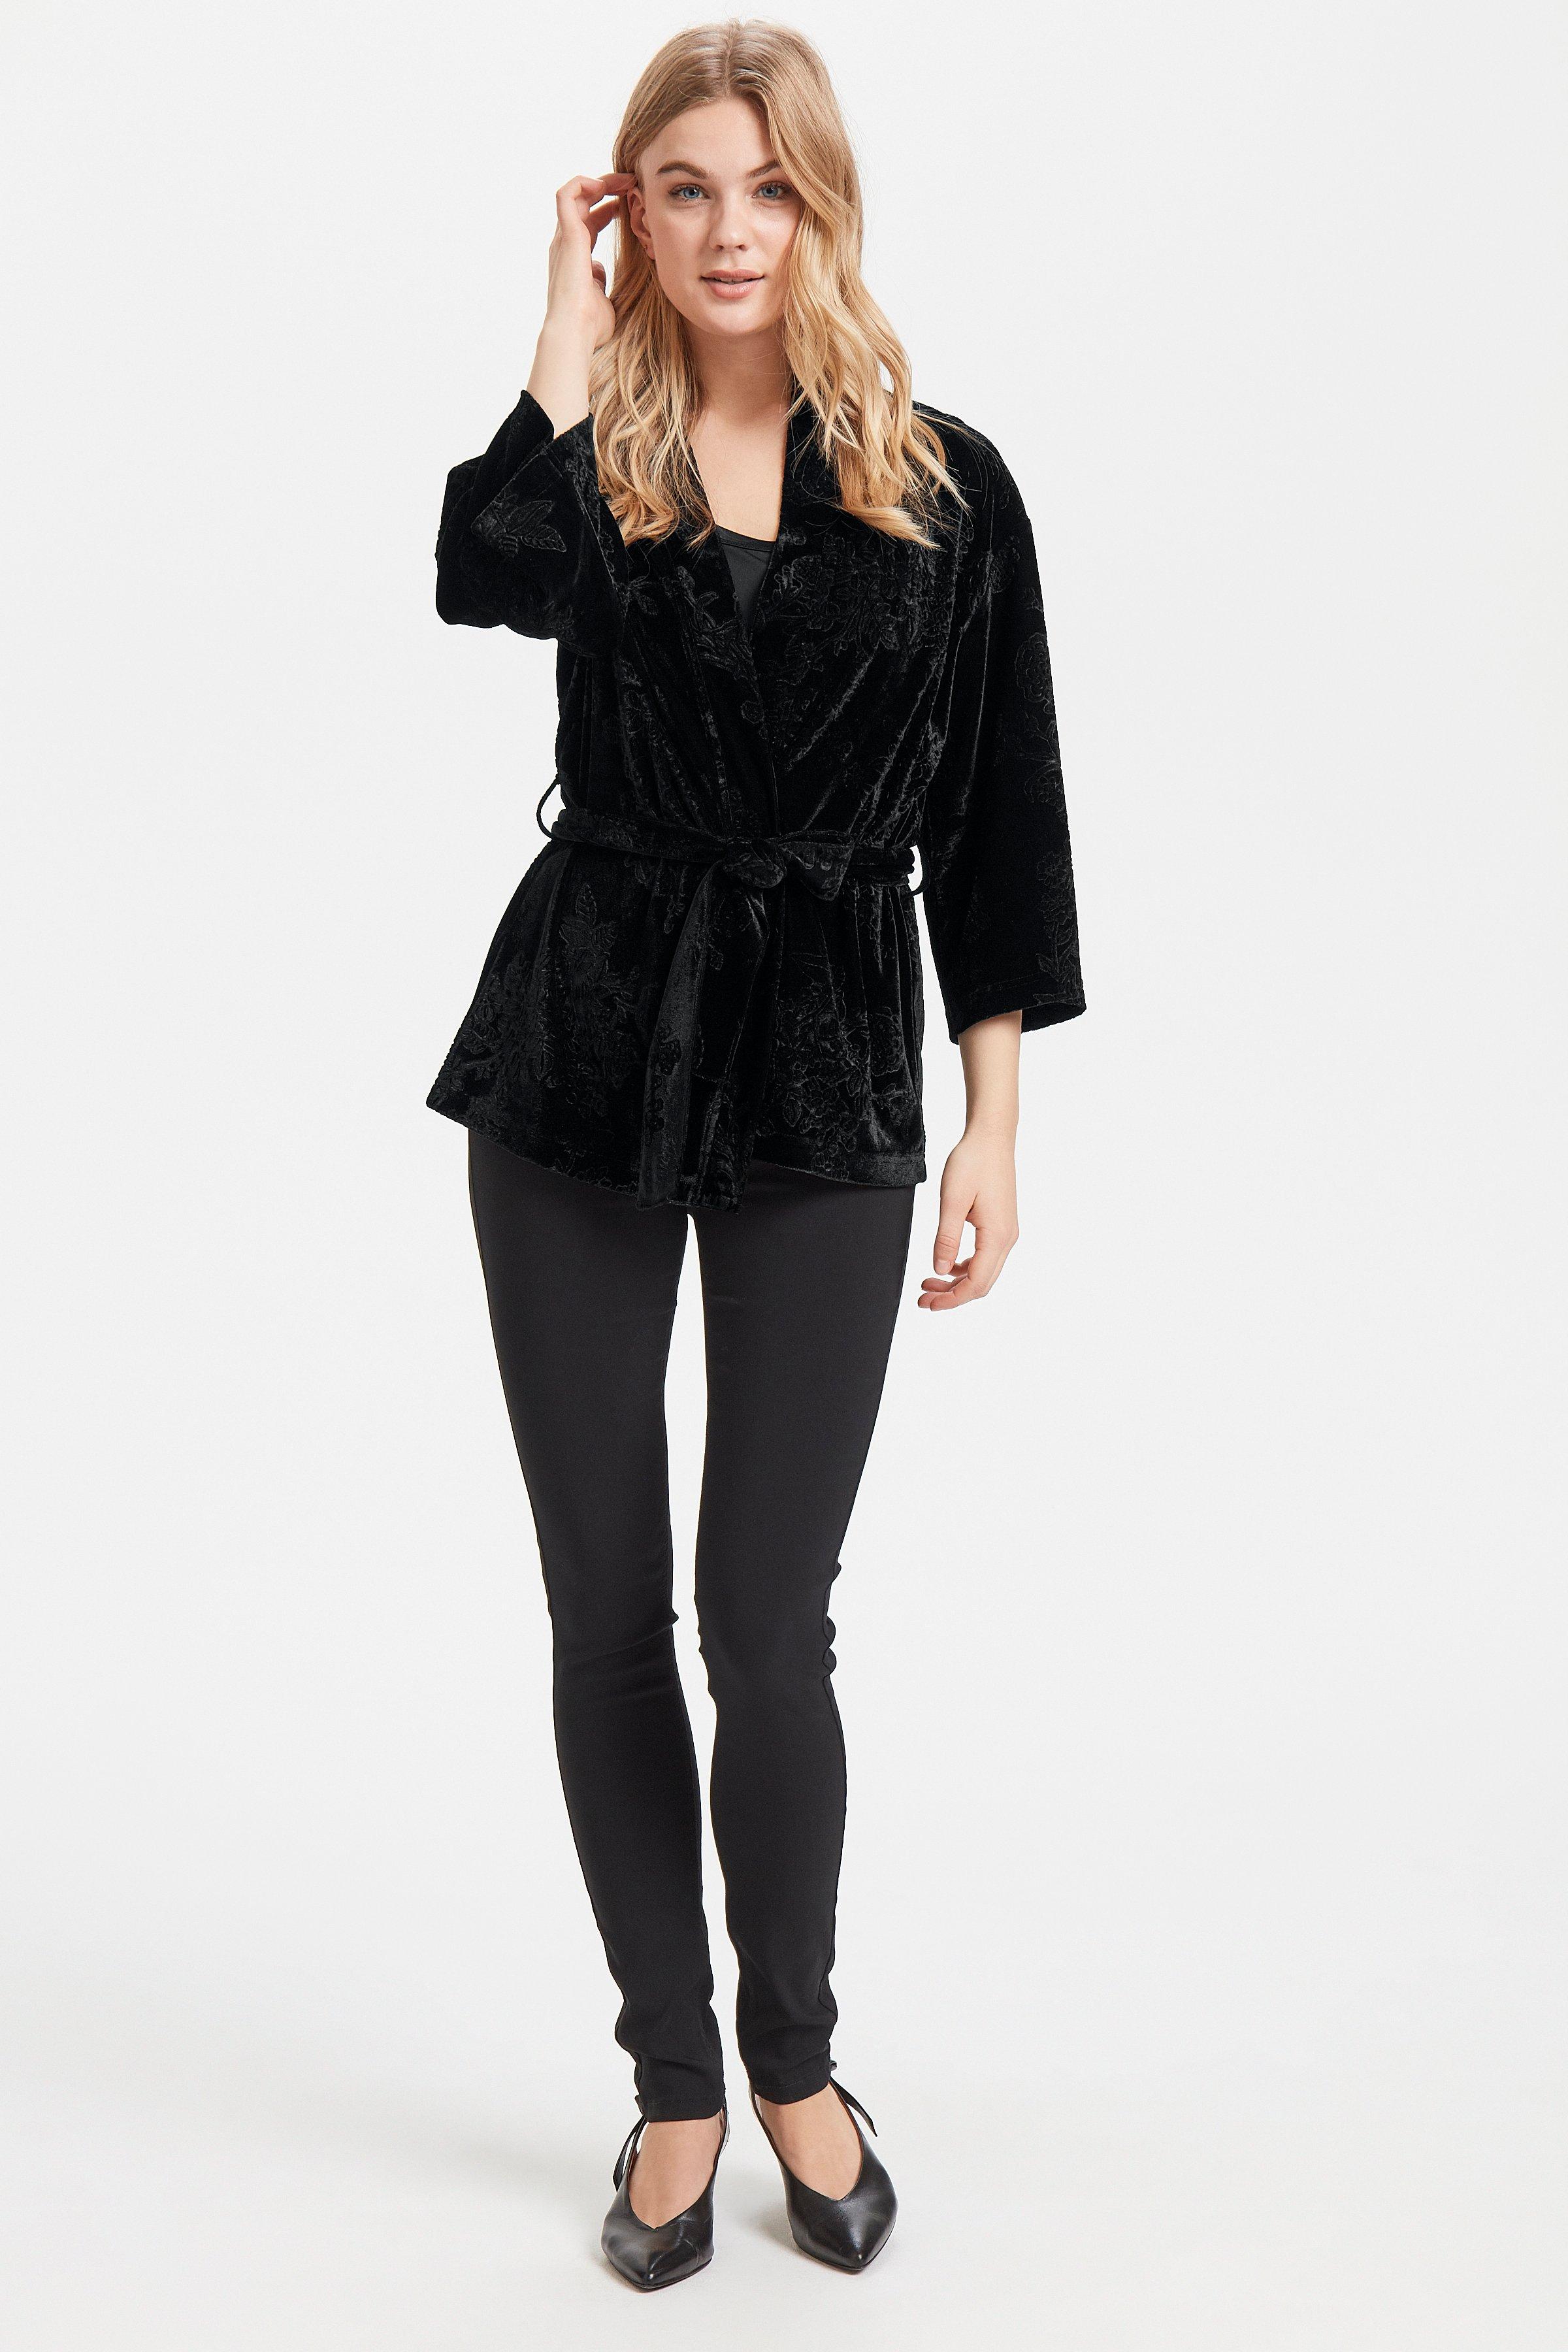 Black Kimono fra b.young - Kjøp Black Kimono fra størrelse XS-XXL her